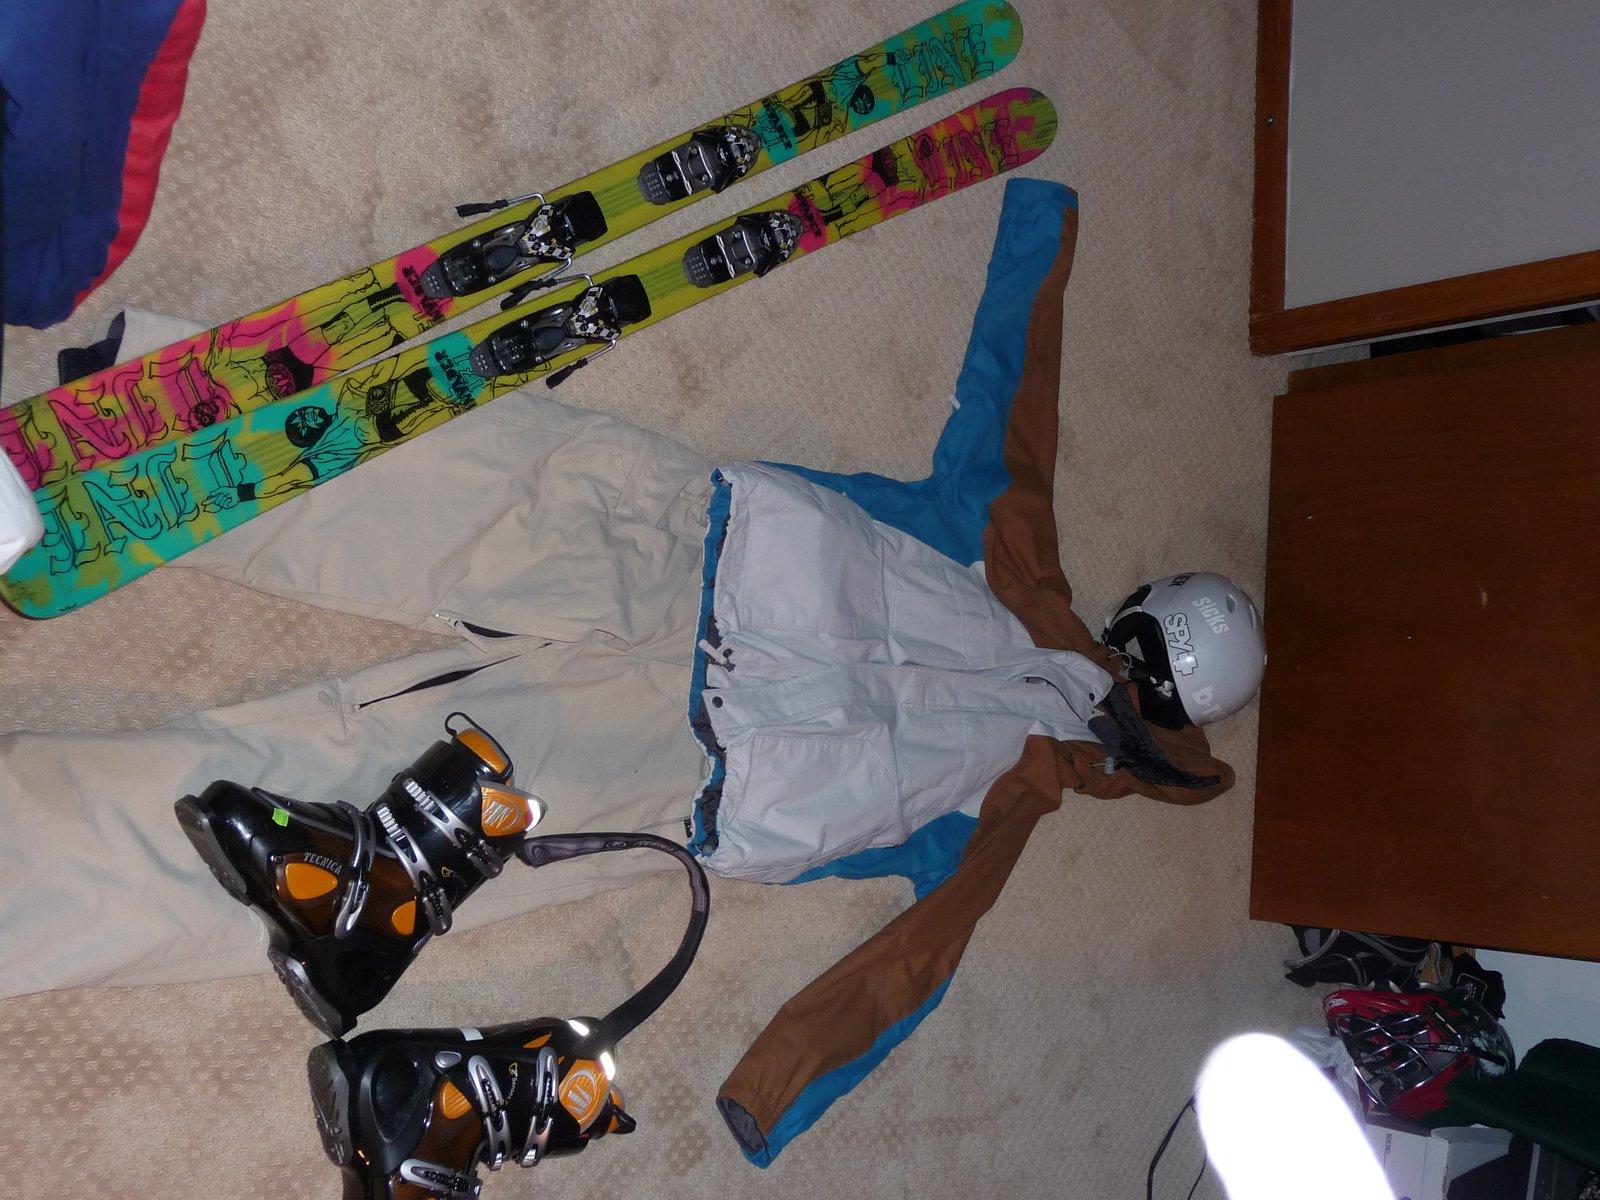 08-09 Set up